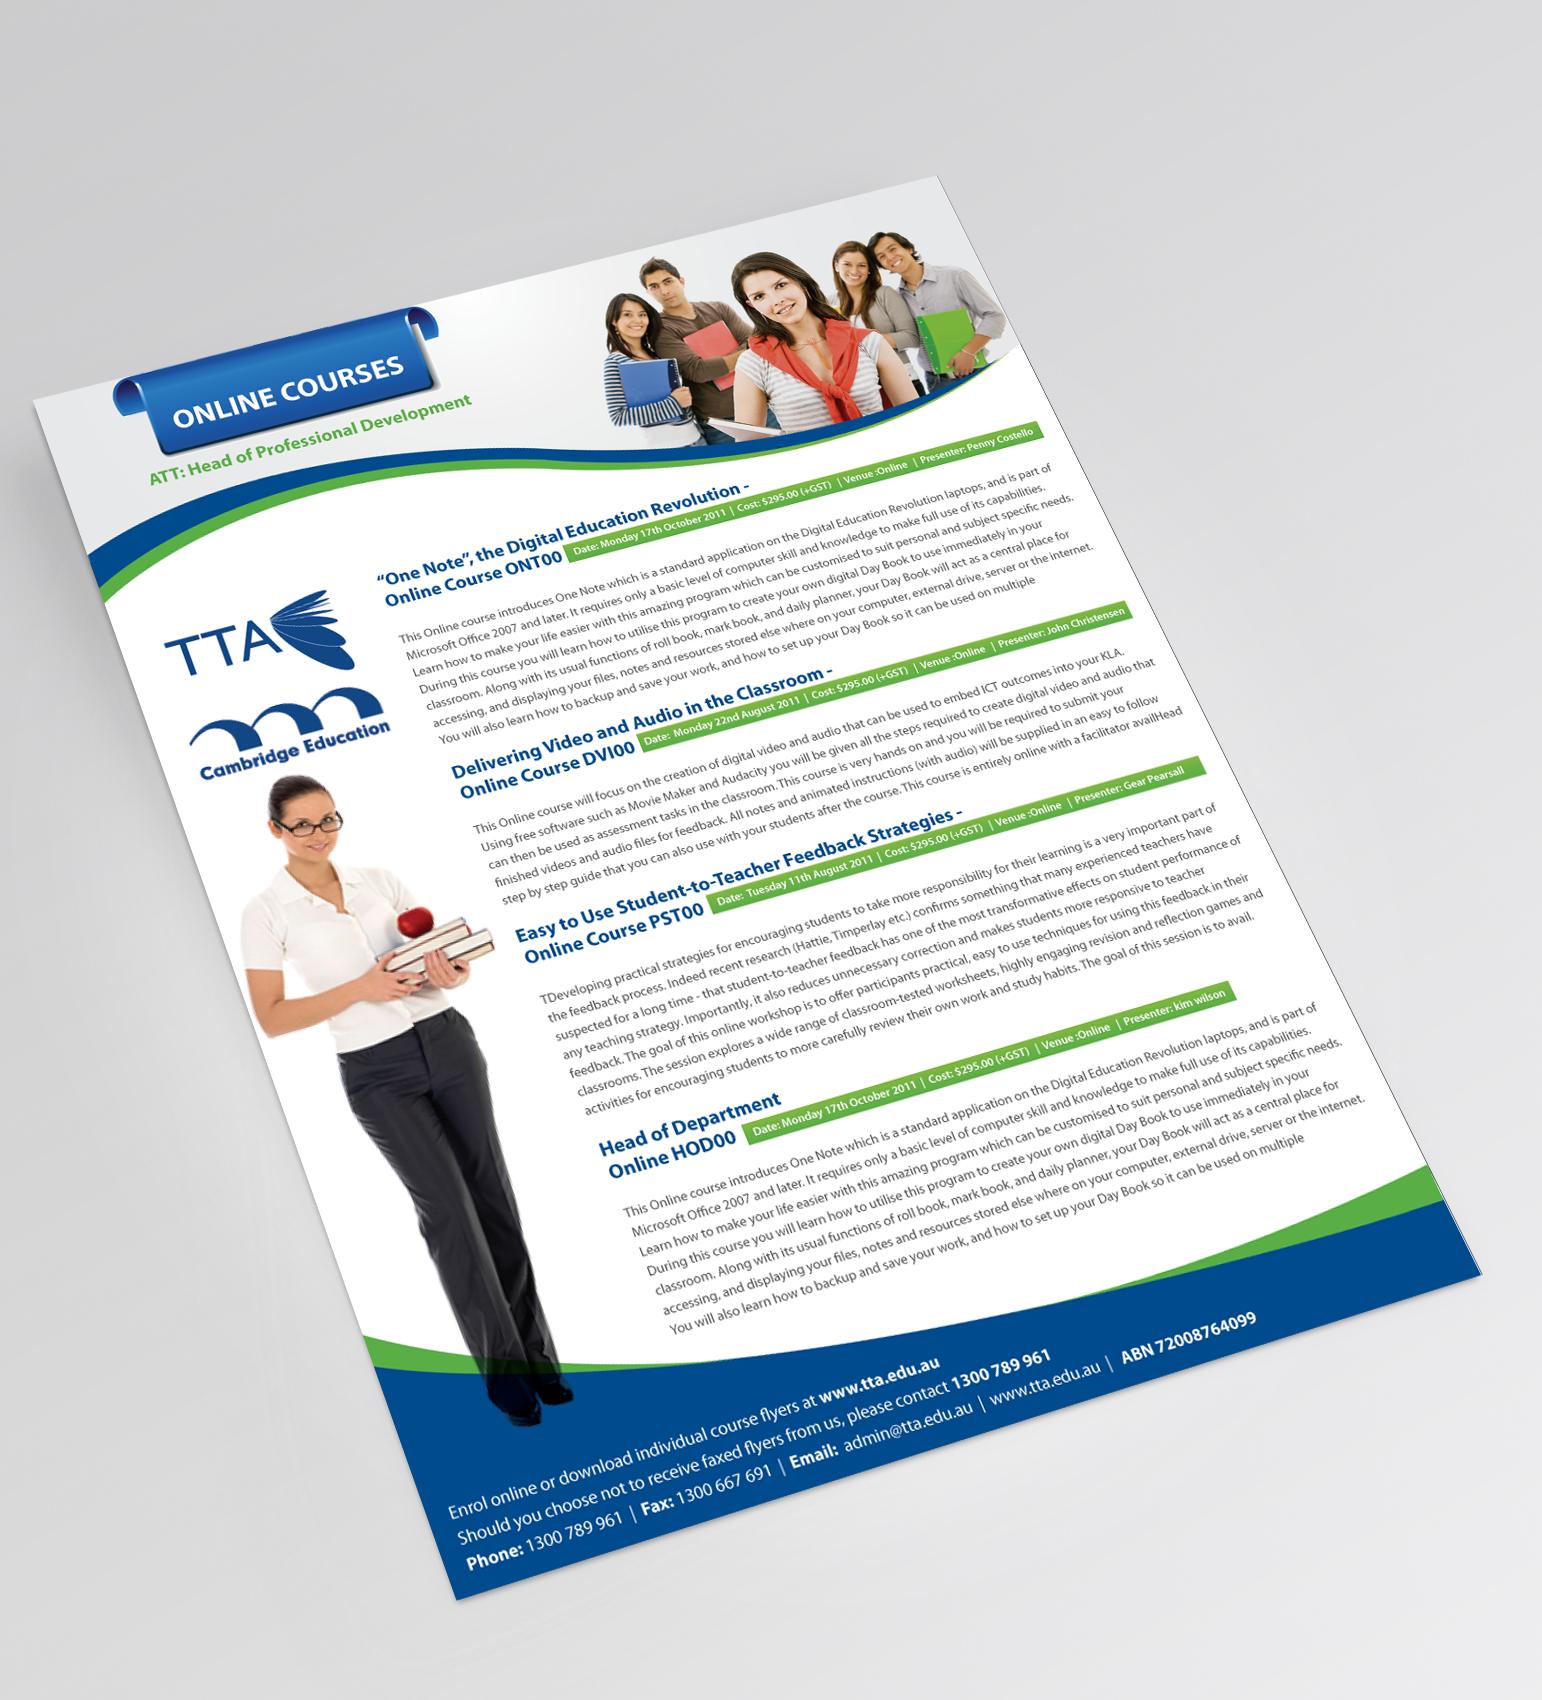 Create the next postcard or flyer for Teacher Training Australia